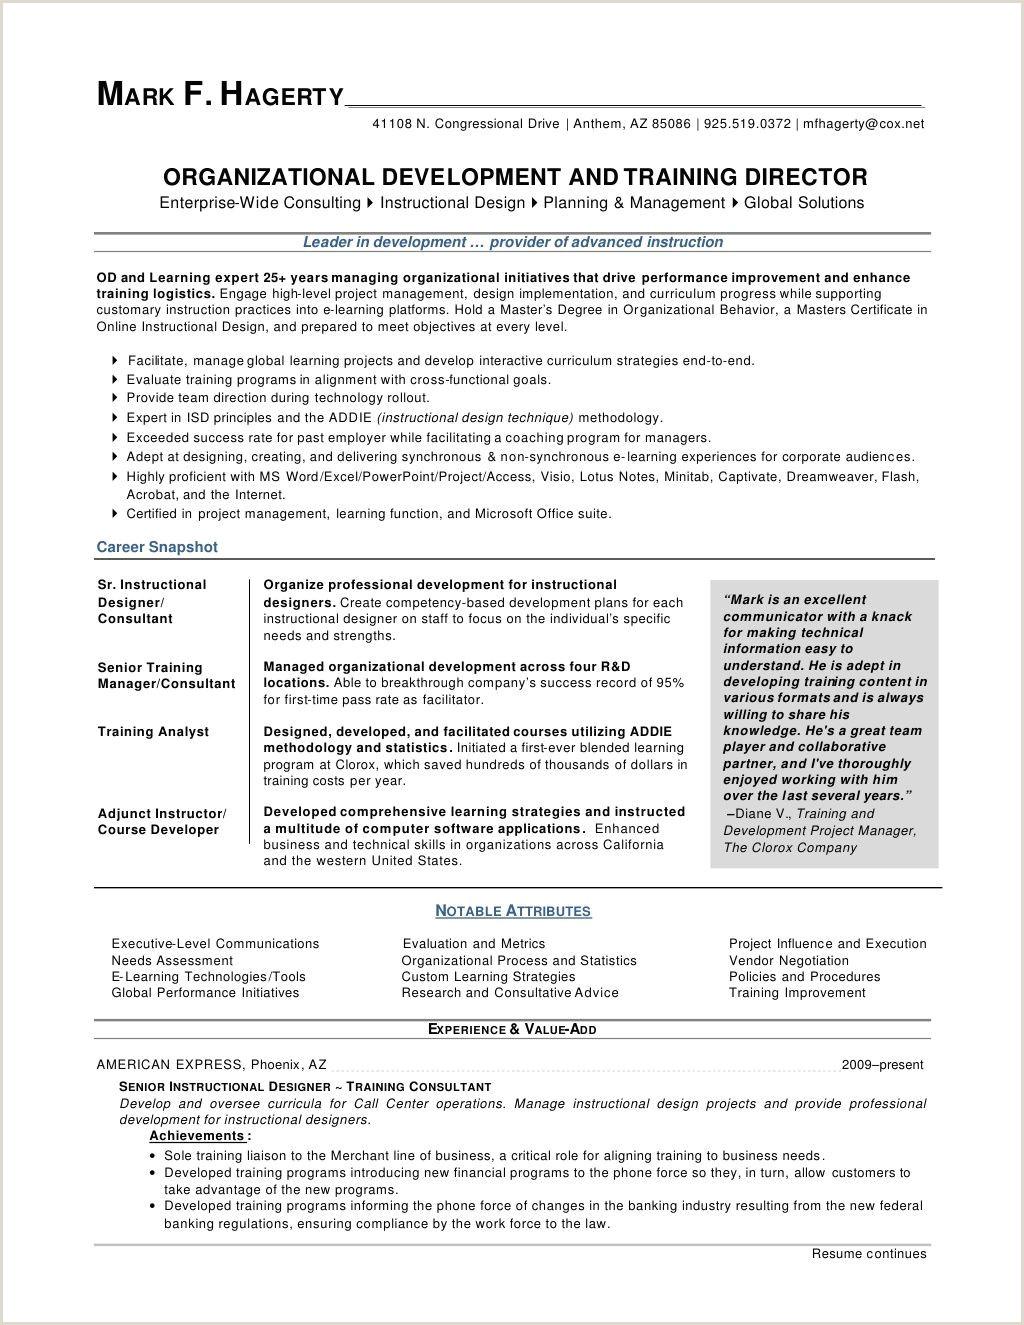 Resume for Math Teacher 85 Executive Level Resume Samples